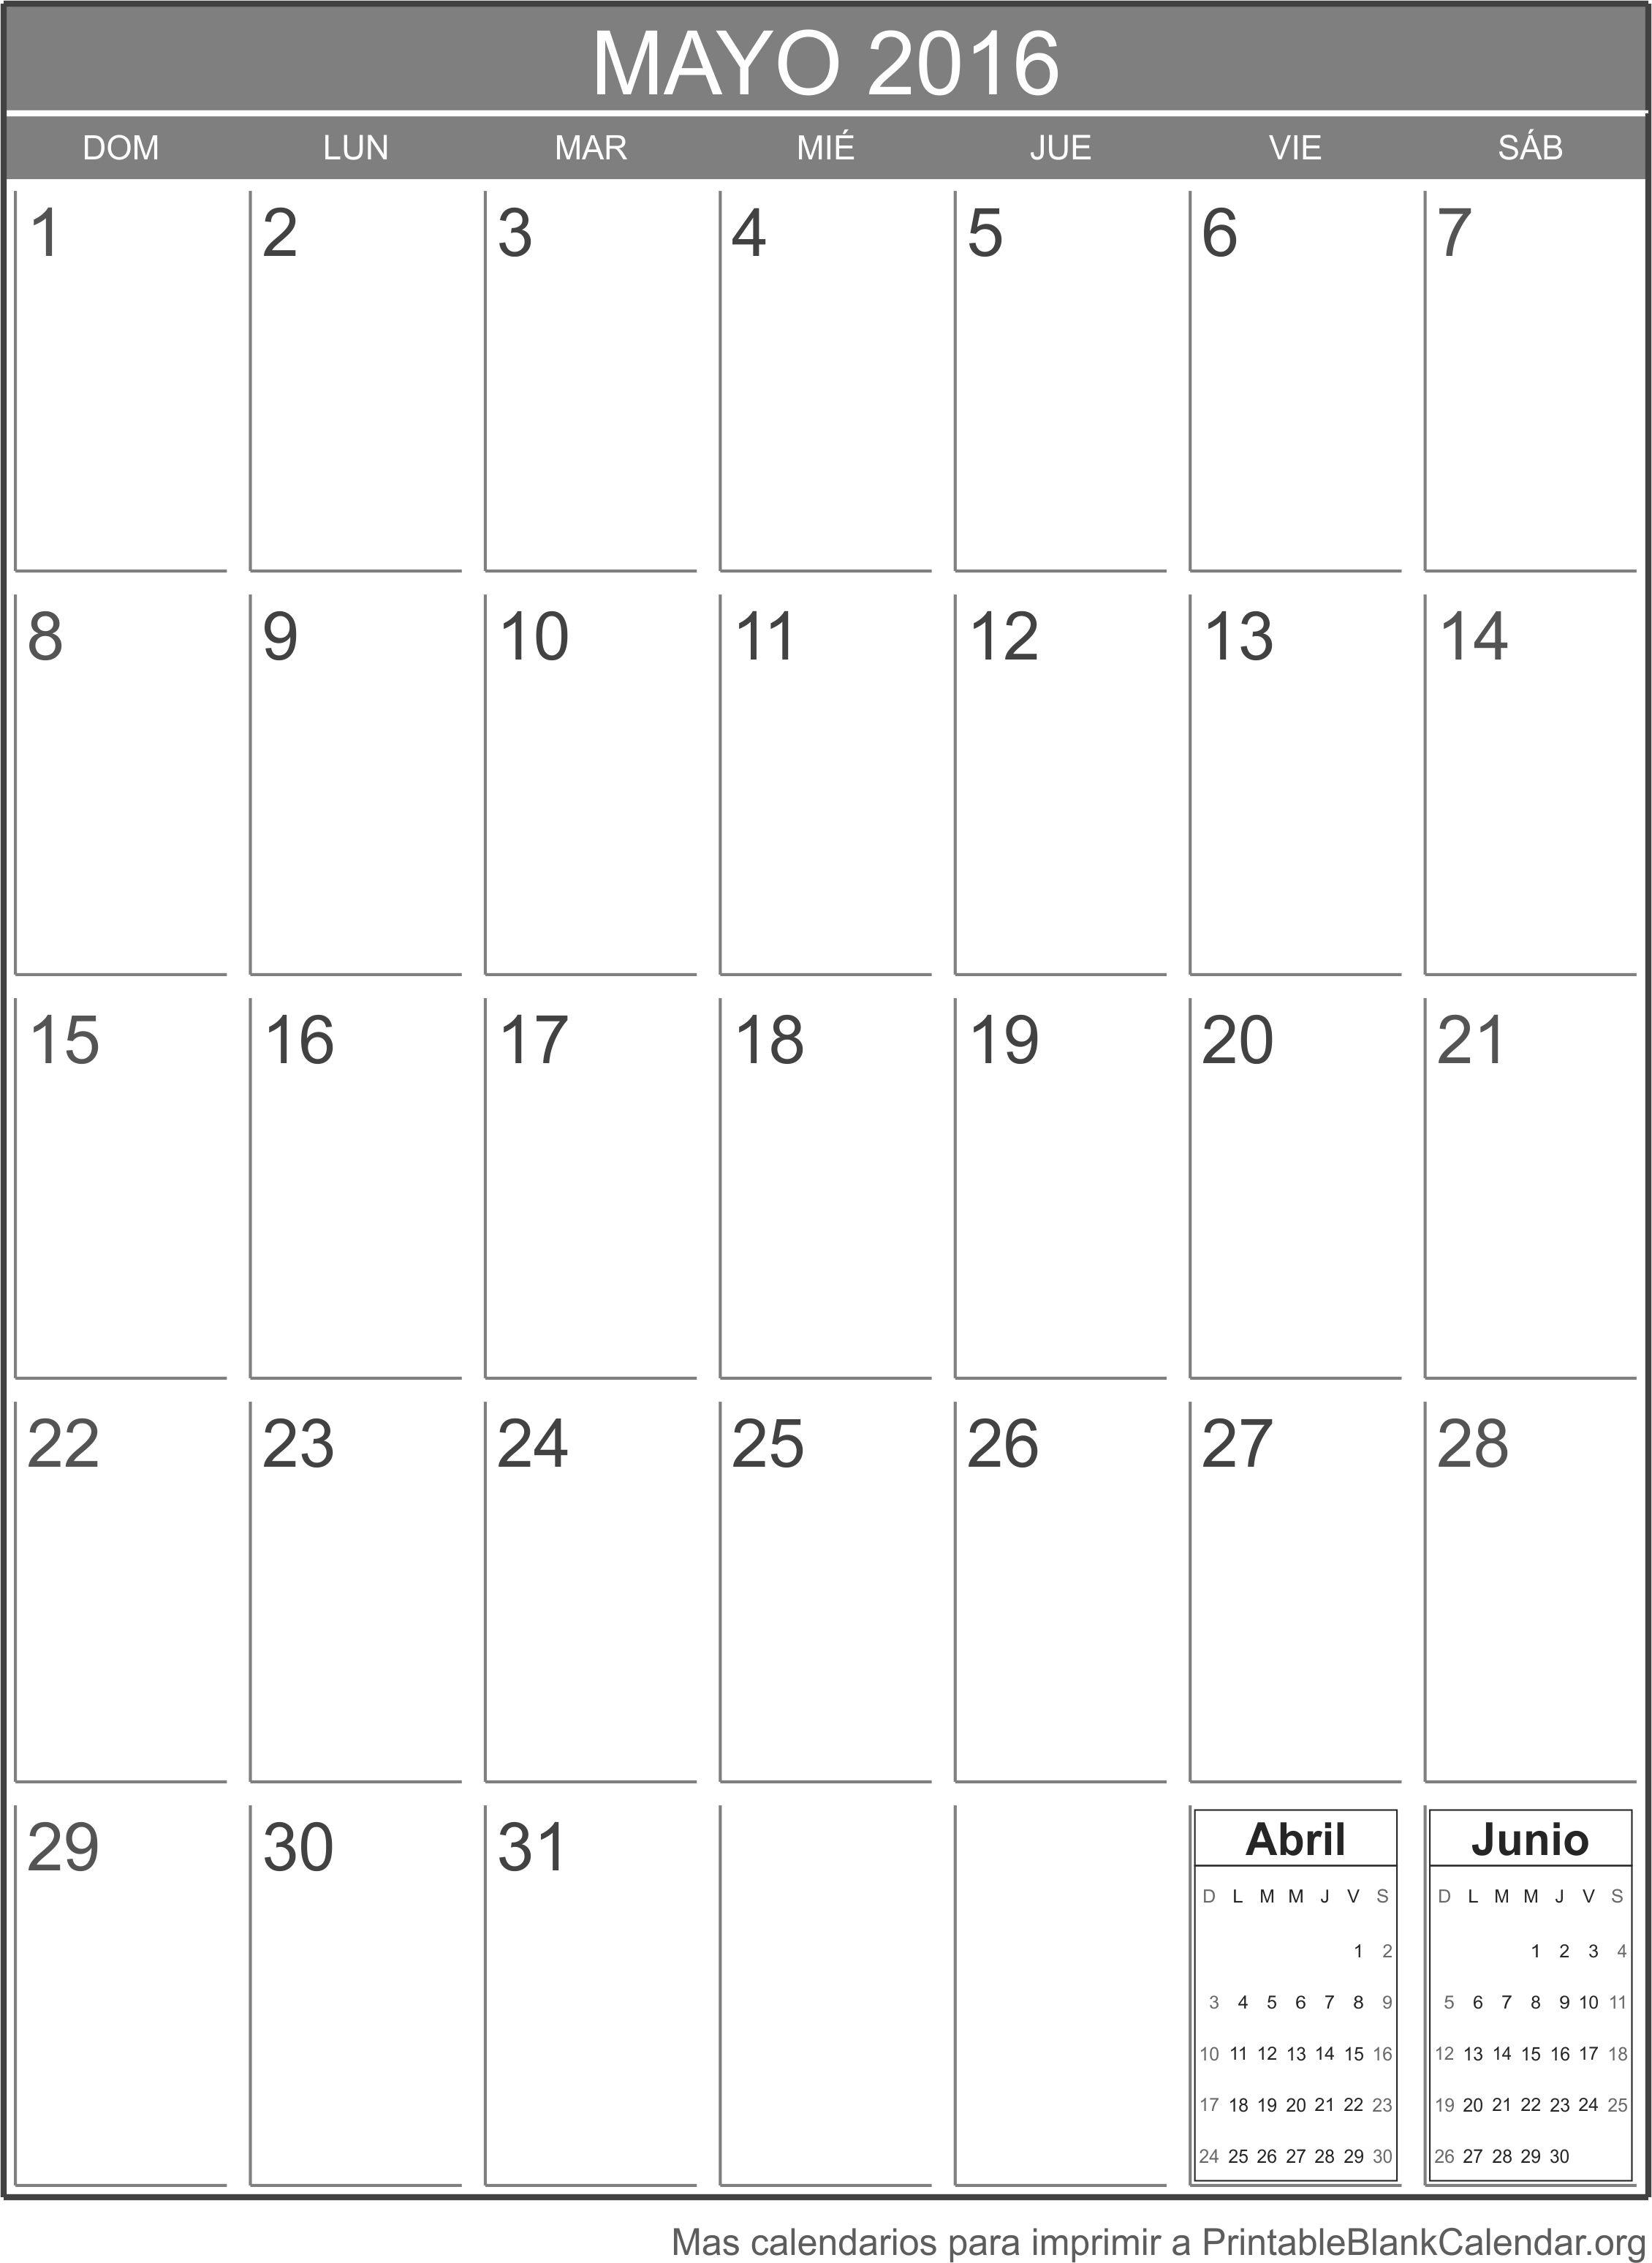 Mayo 2016 calendario